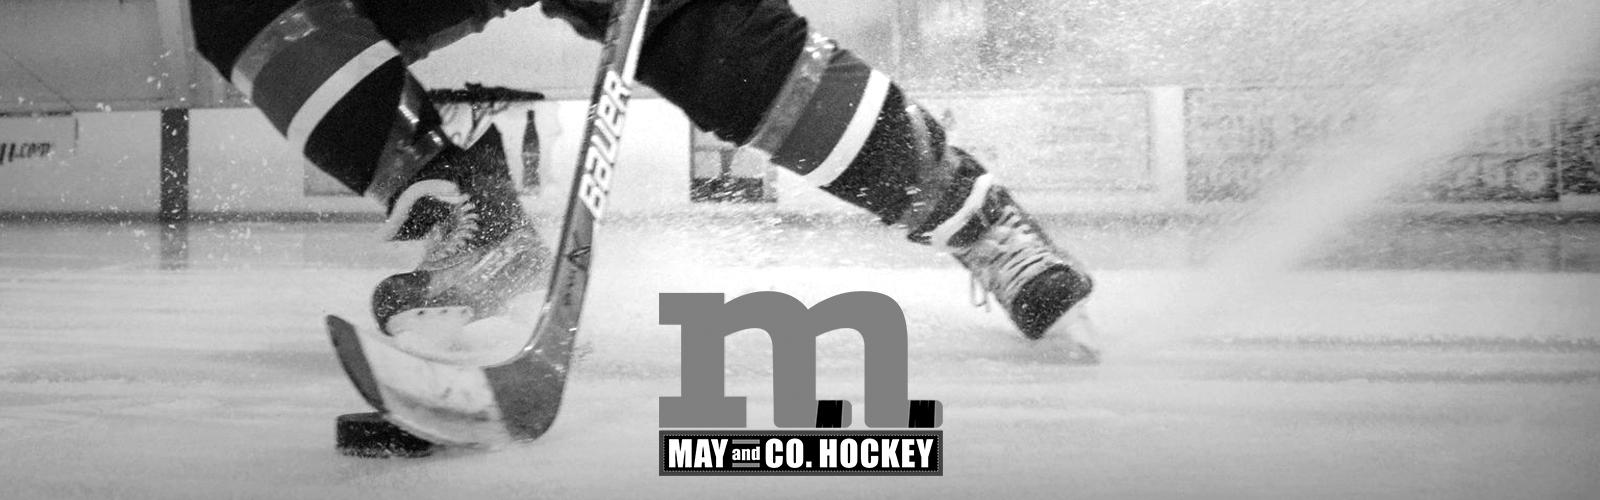 May and Co. Hockey